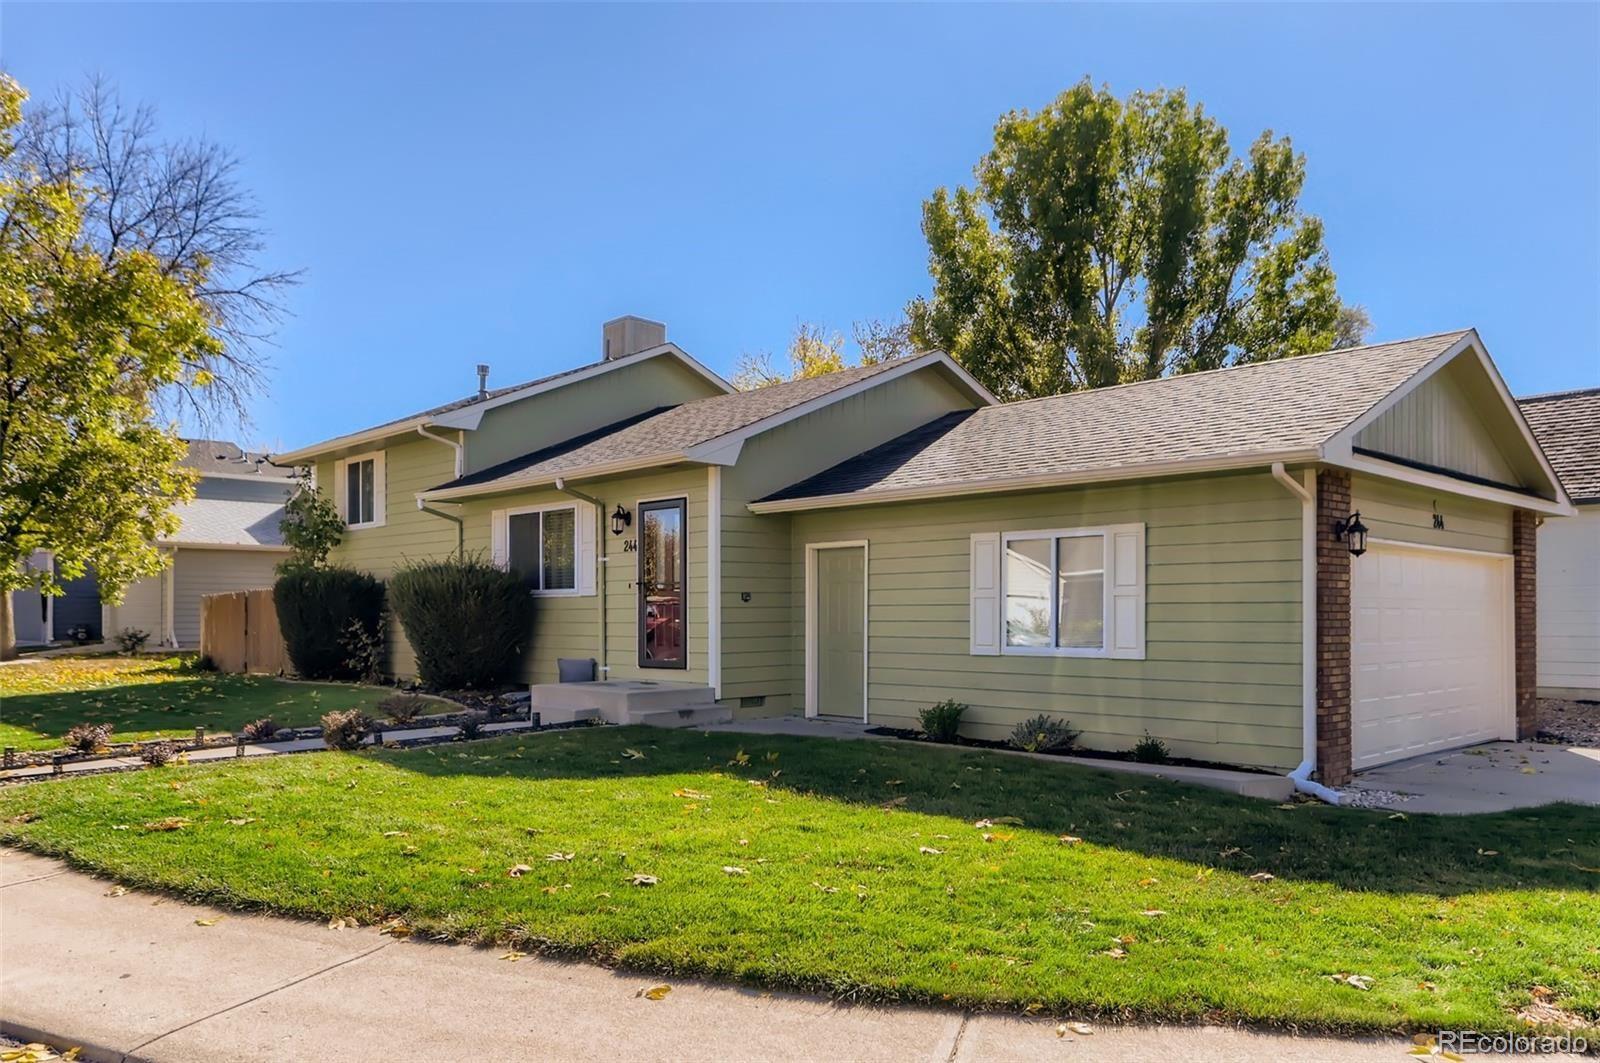 Photo of 244 Wadsworth Circle, Longmont, CO 80504 (MLS # 9666572)